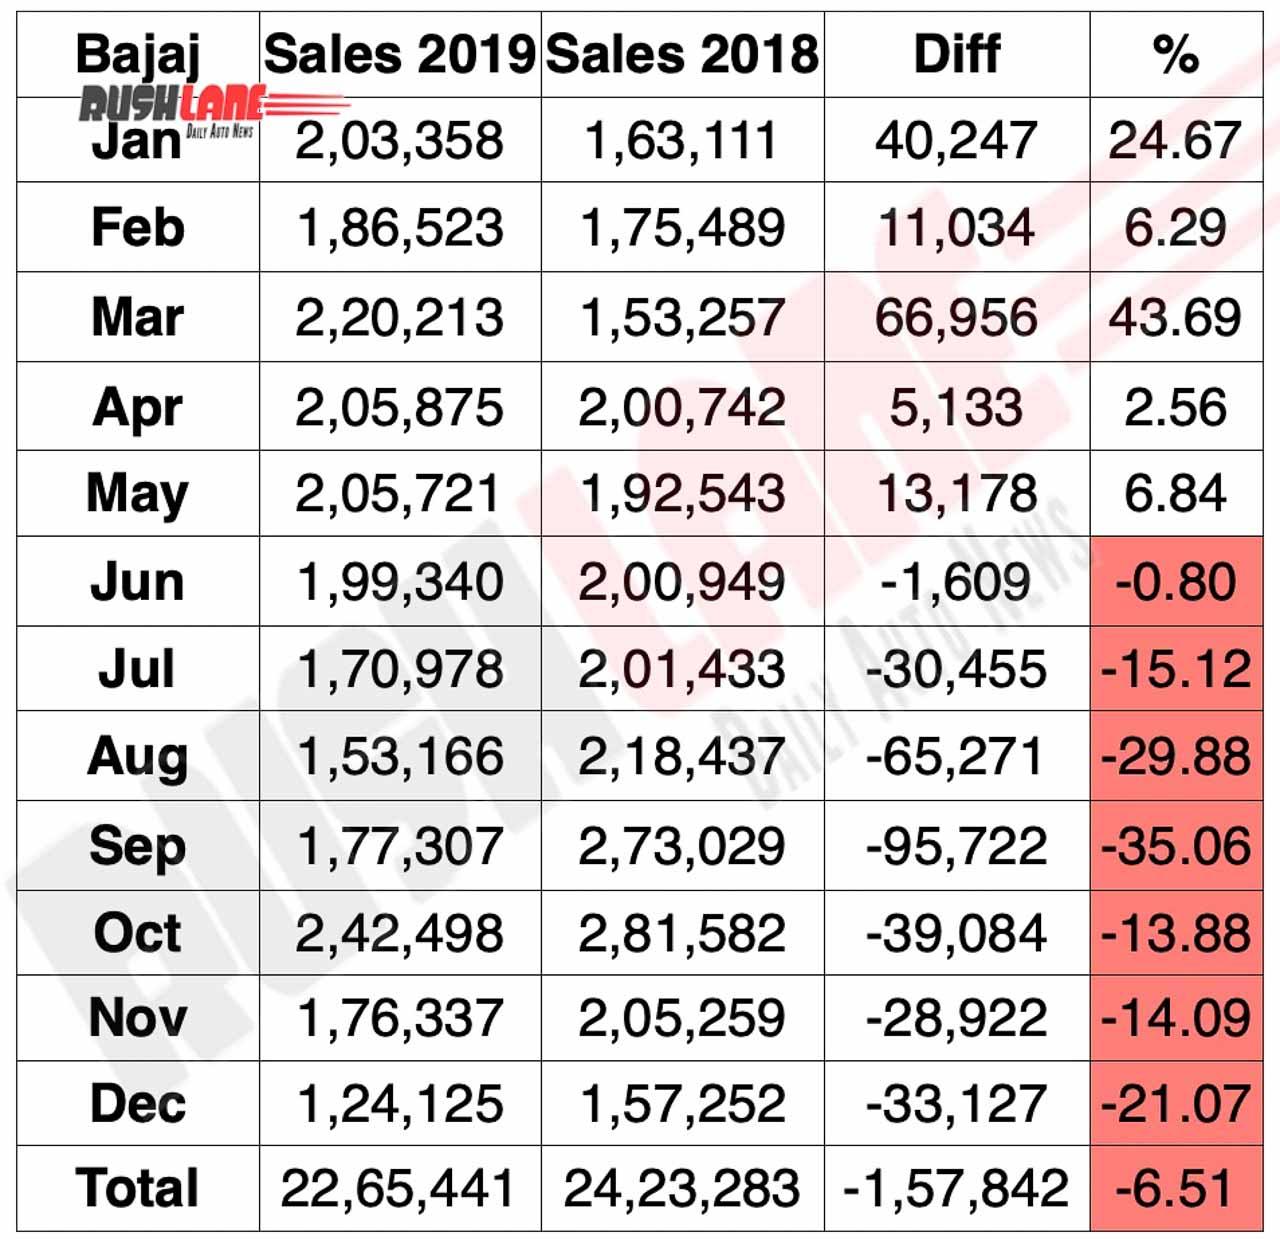 Bajaj sales report for CY 2019